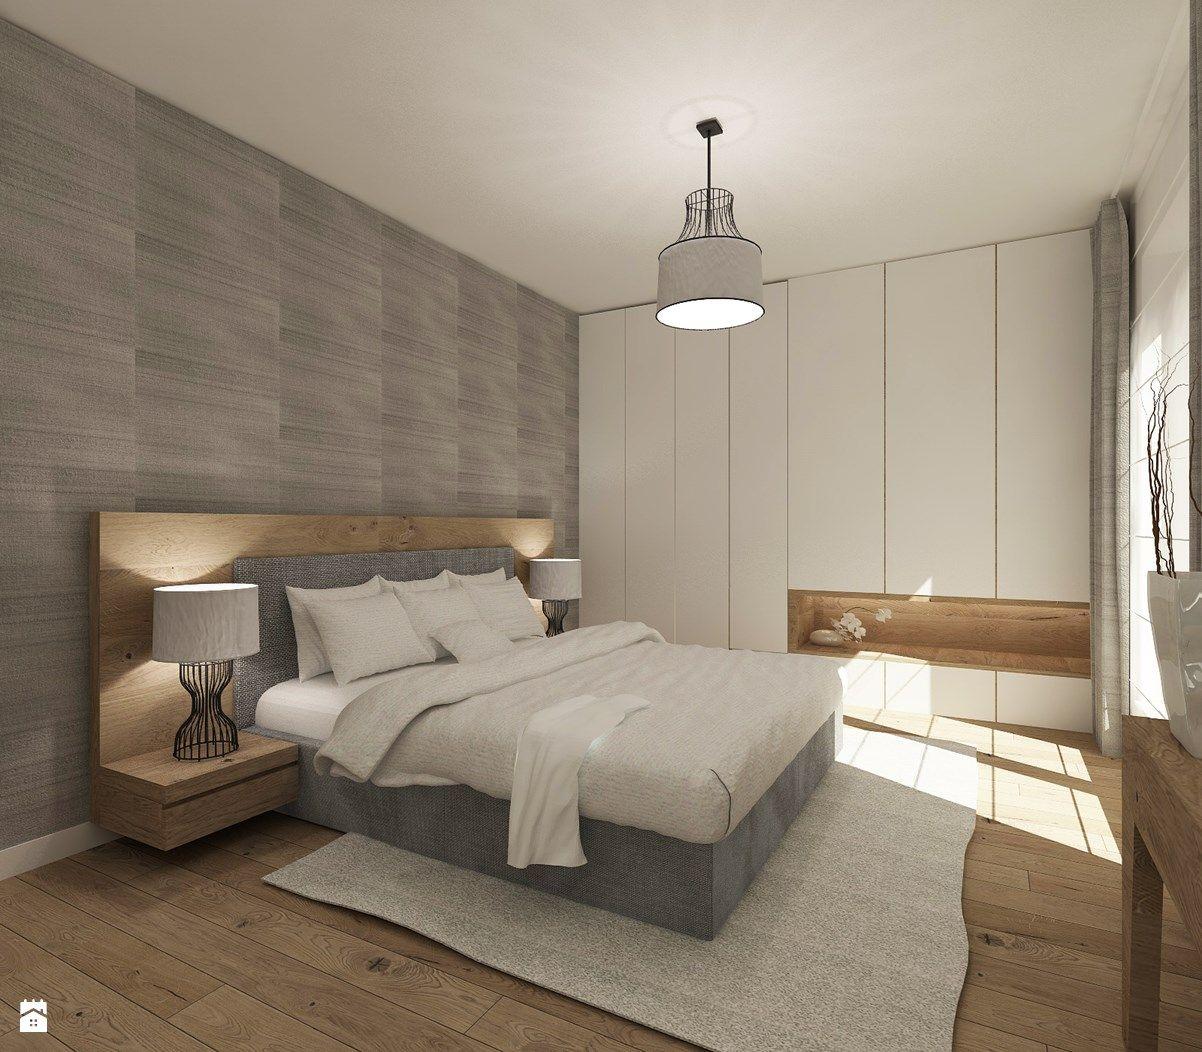 sypialnia styl nowoczesny zdj cie od 4ma projekt simplicity deco pinterest schlafzimmer. Black Bedroom Furniture Sets. Home Design Ideas